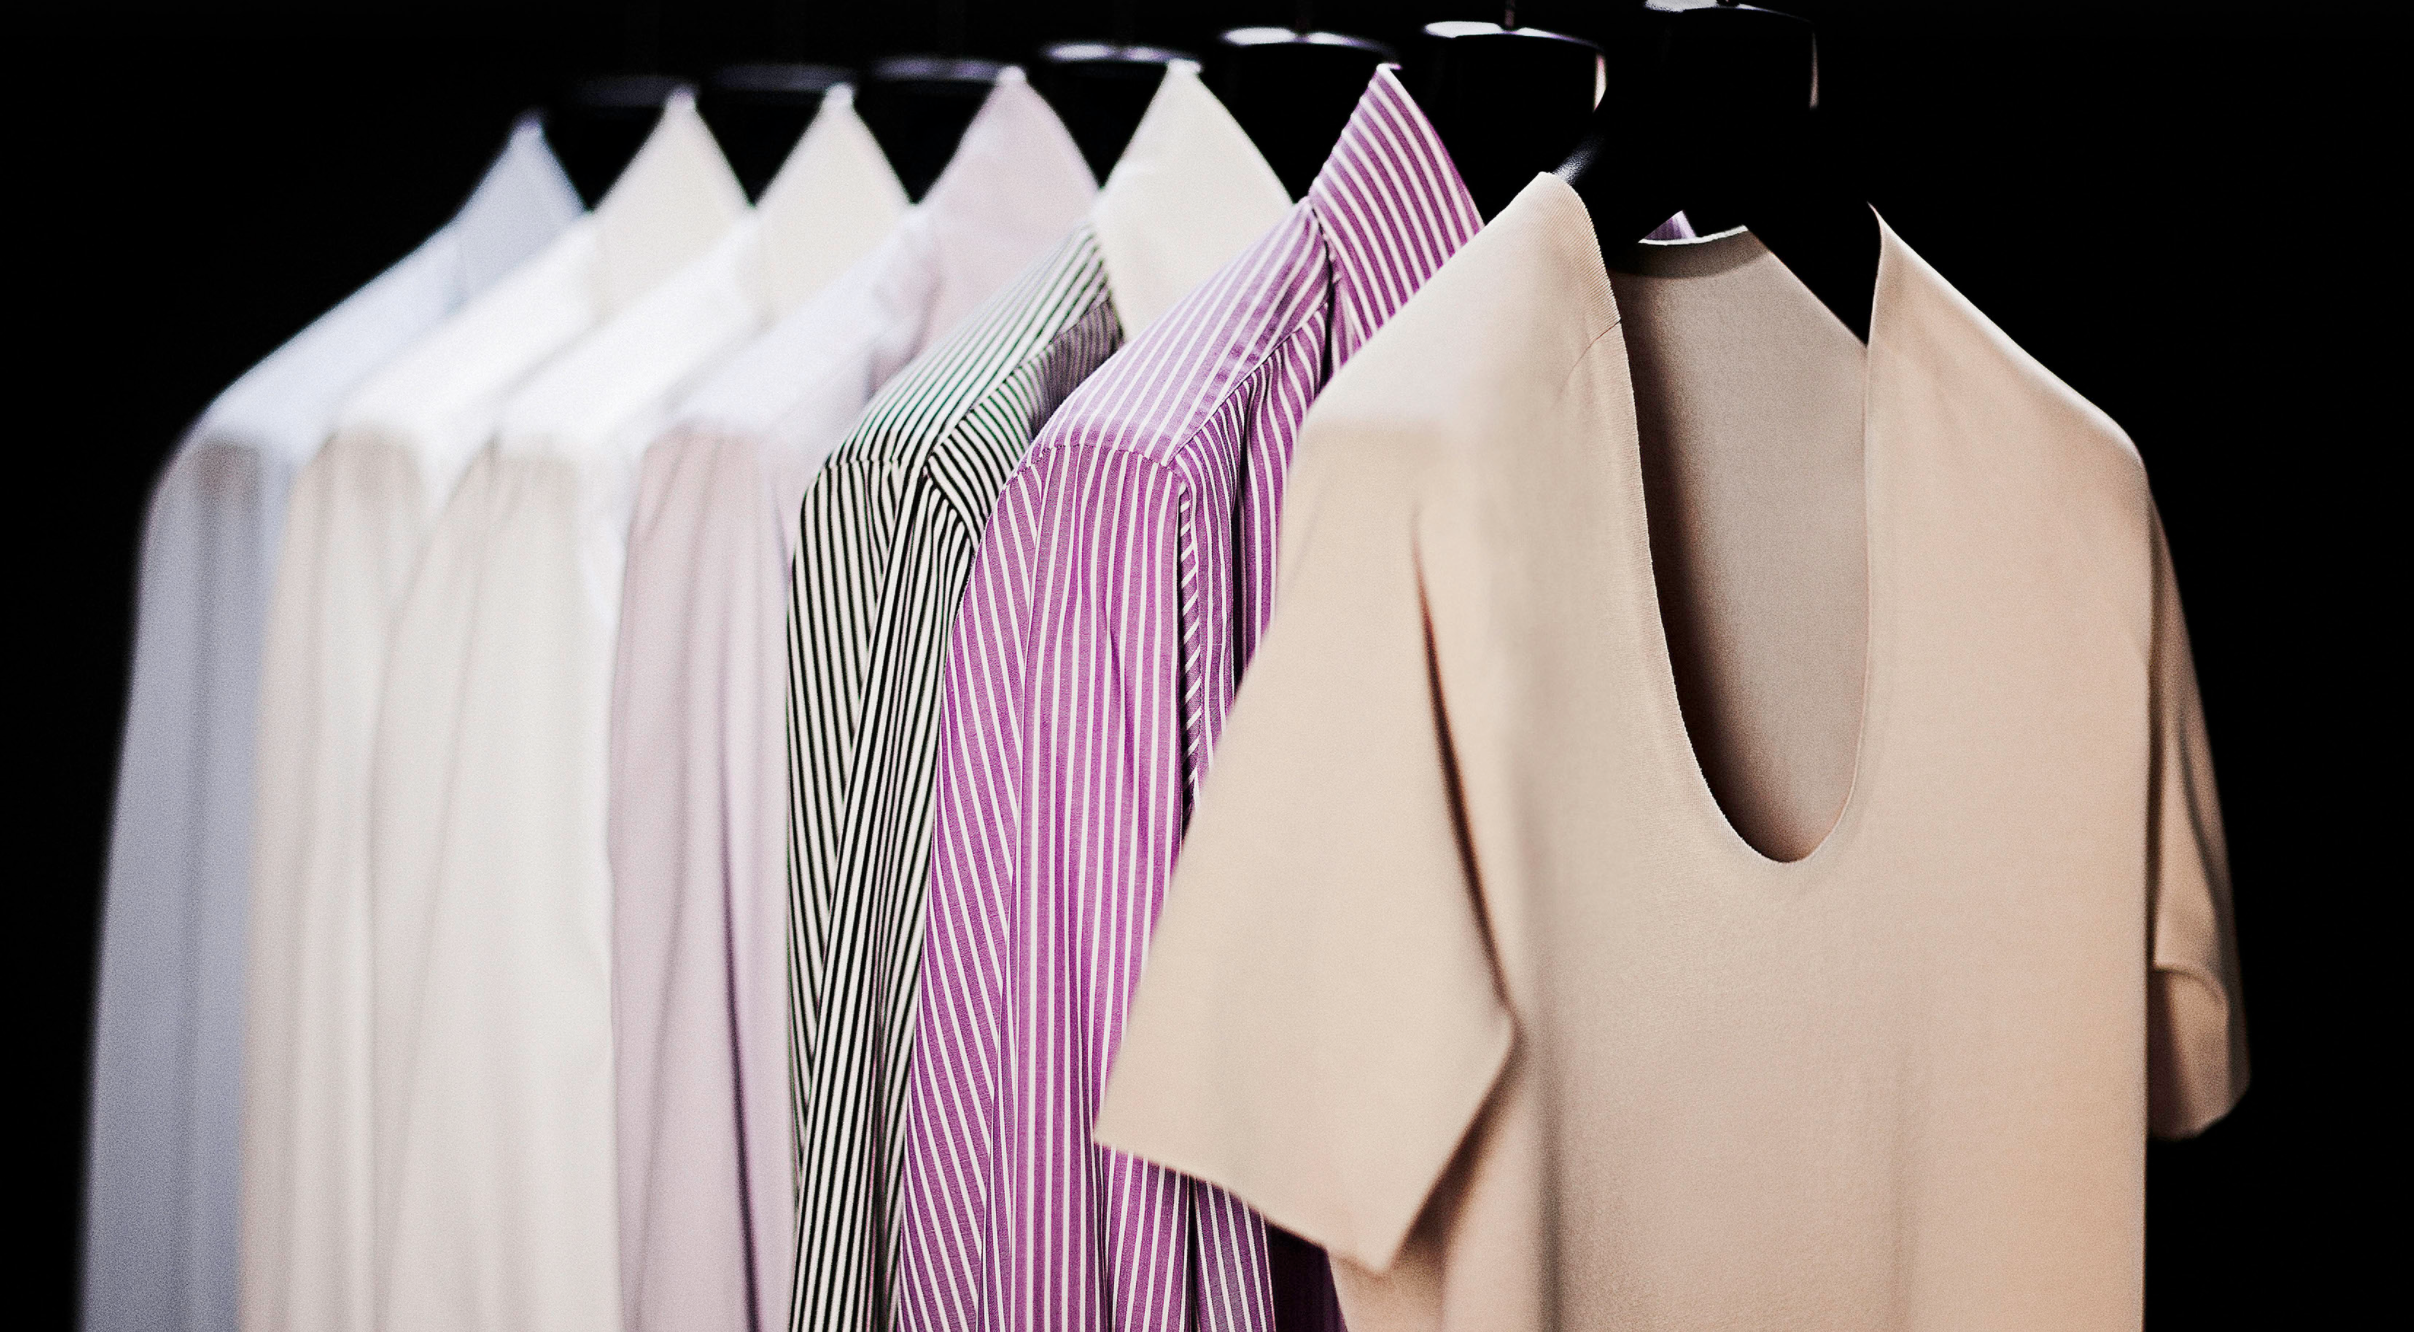 giin elevated garments undergarments shirt undershirt review